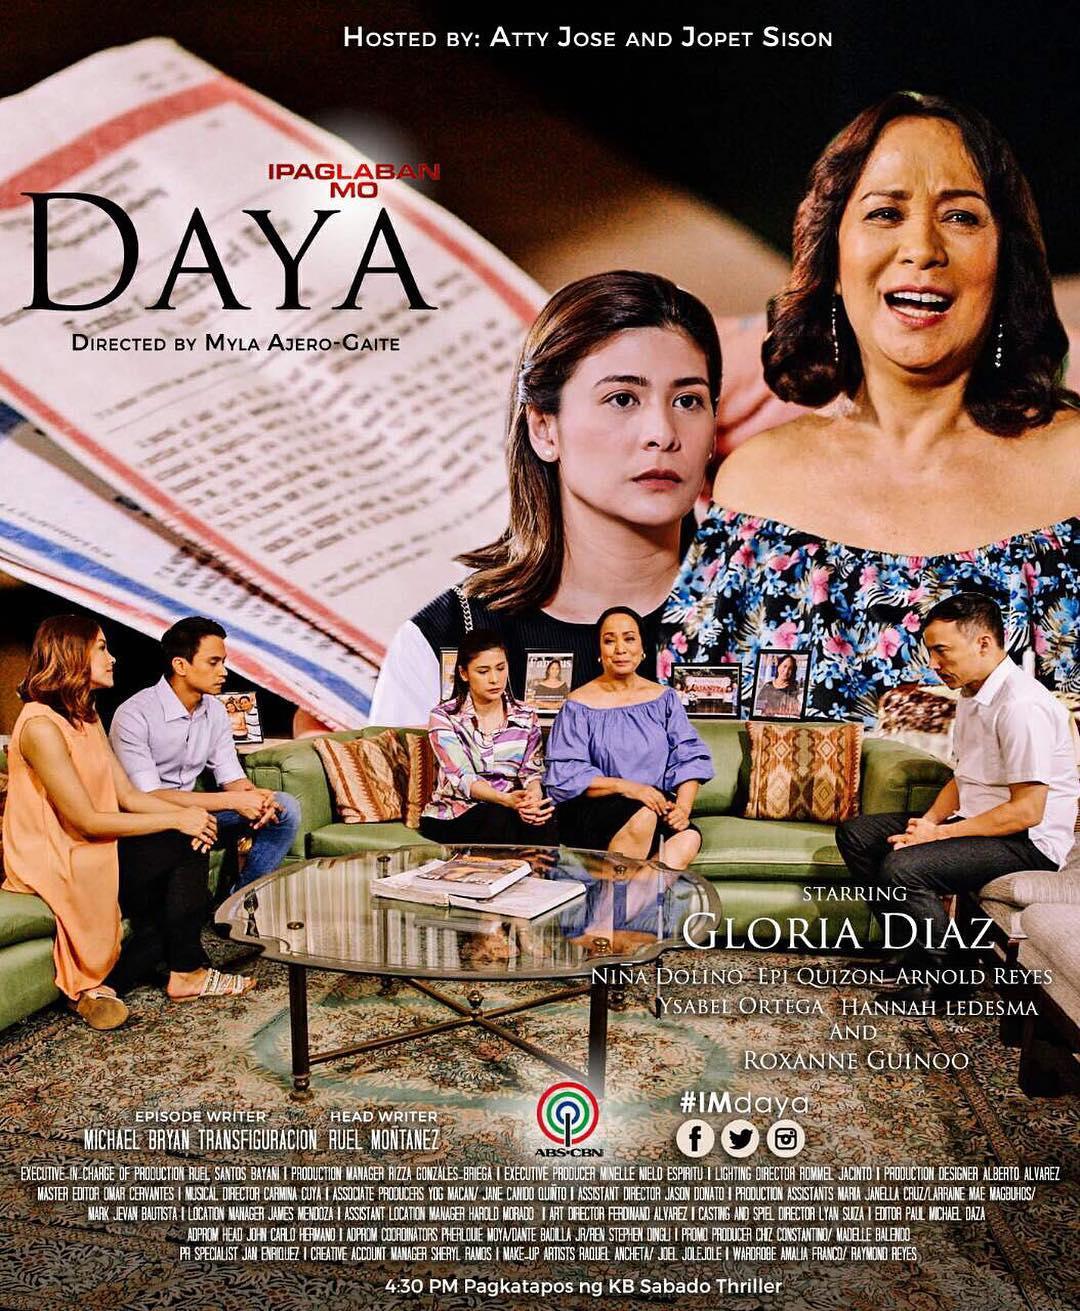 Gloria Diaz, Jeffrey Quizon, Roxanne Guinoo, Arnold Reyes, and Niña Dolino in Ipaglaban mo (2014)